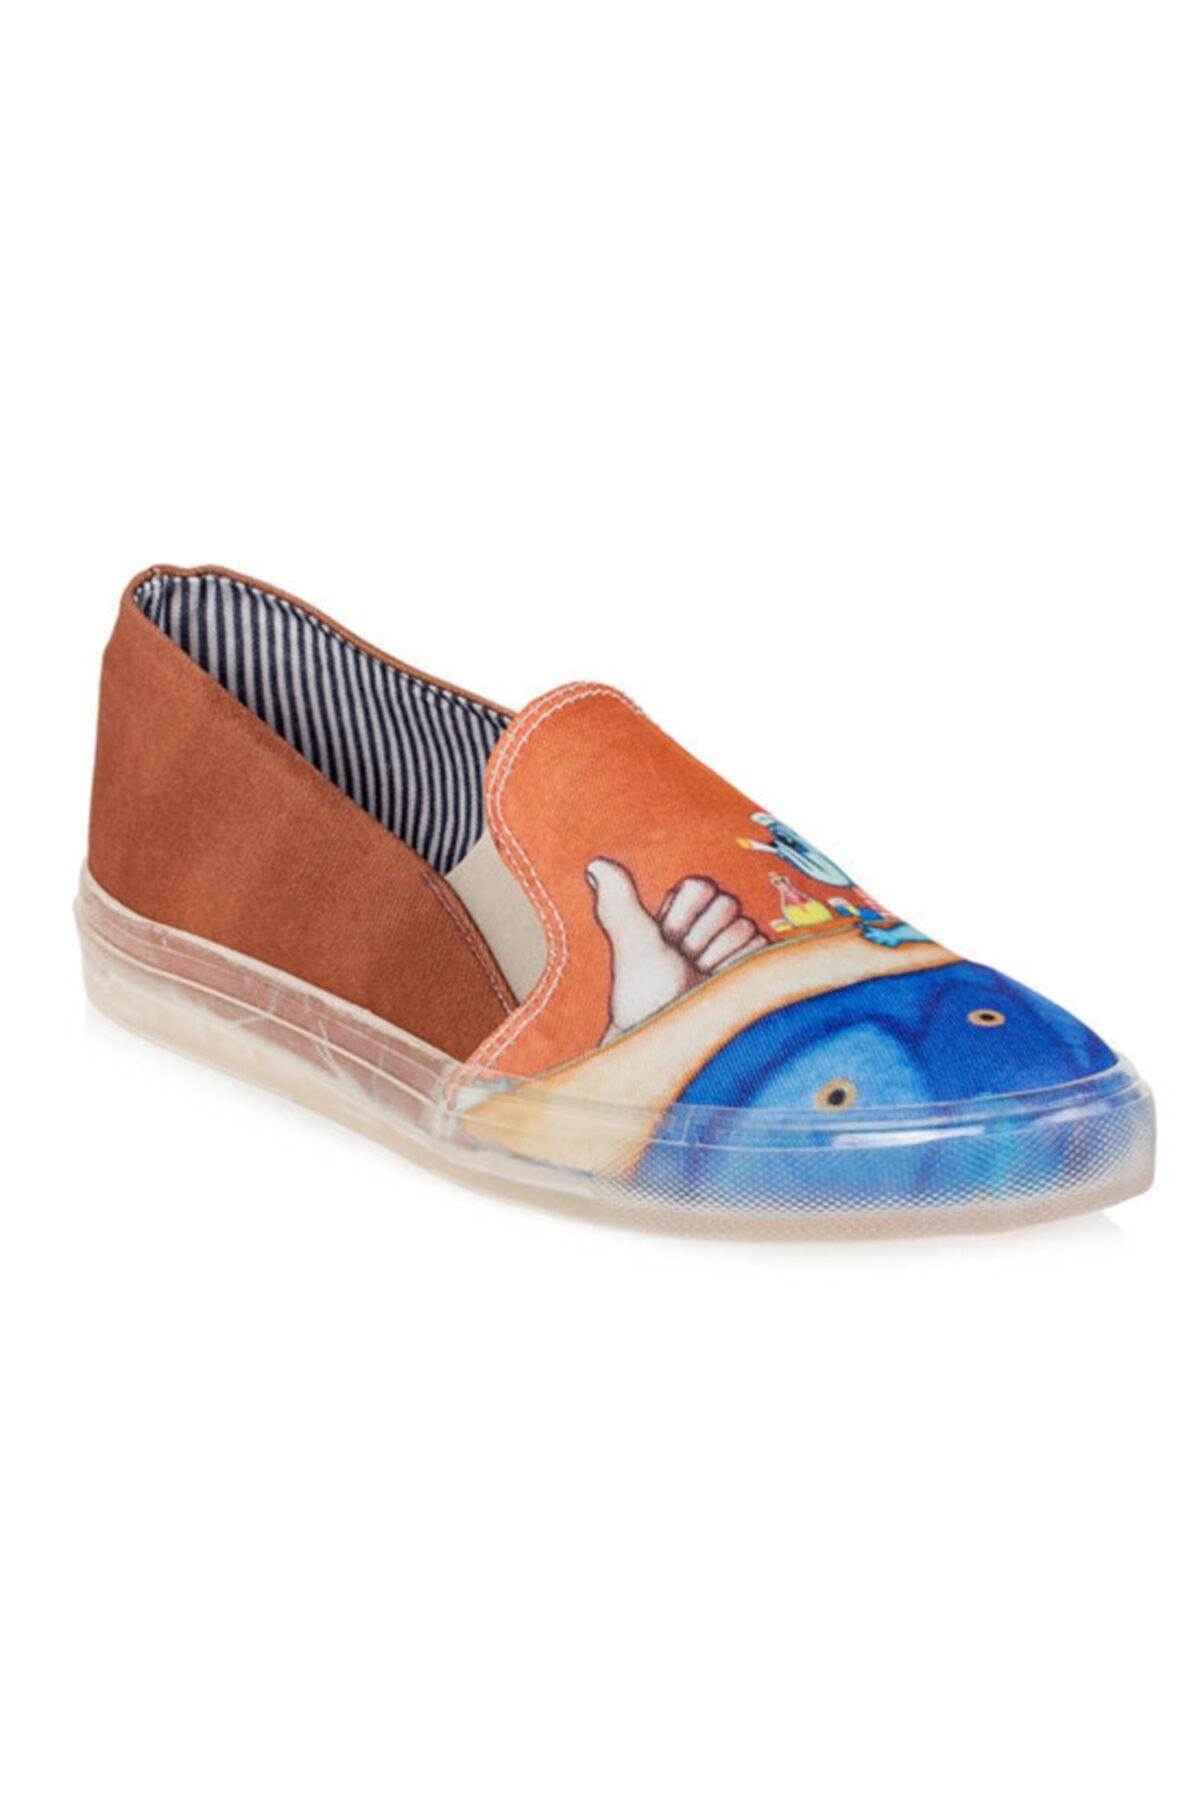 Biggdesign Erkek Kahverengi Mr. Allright Desenli Ayakkabı 2